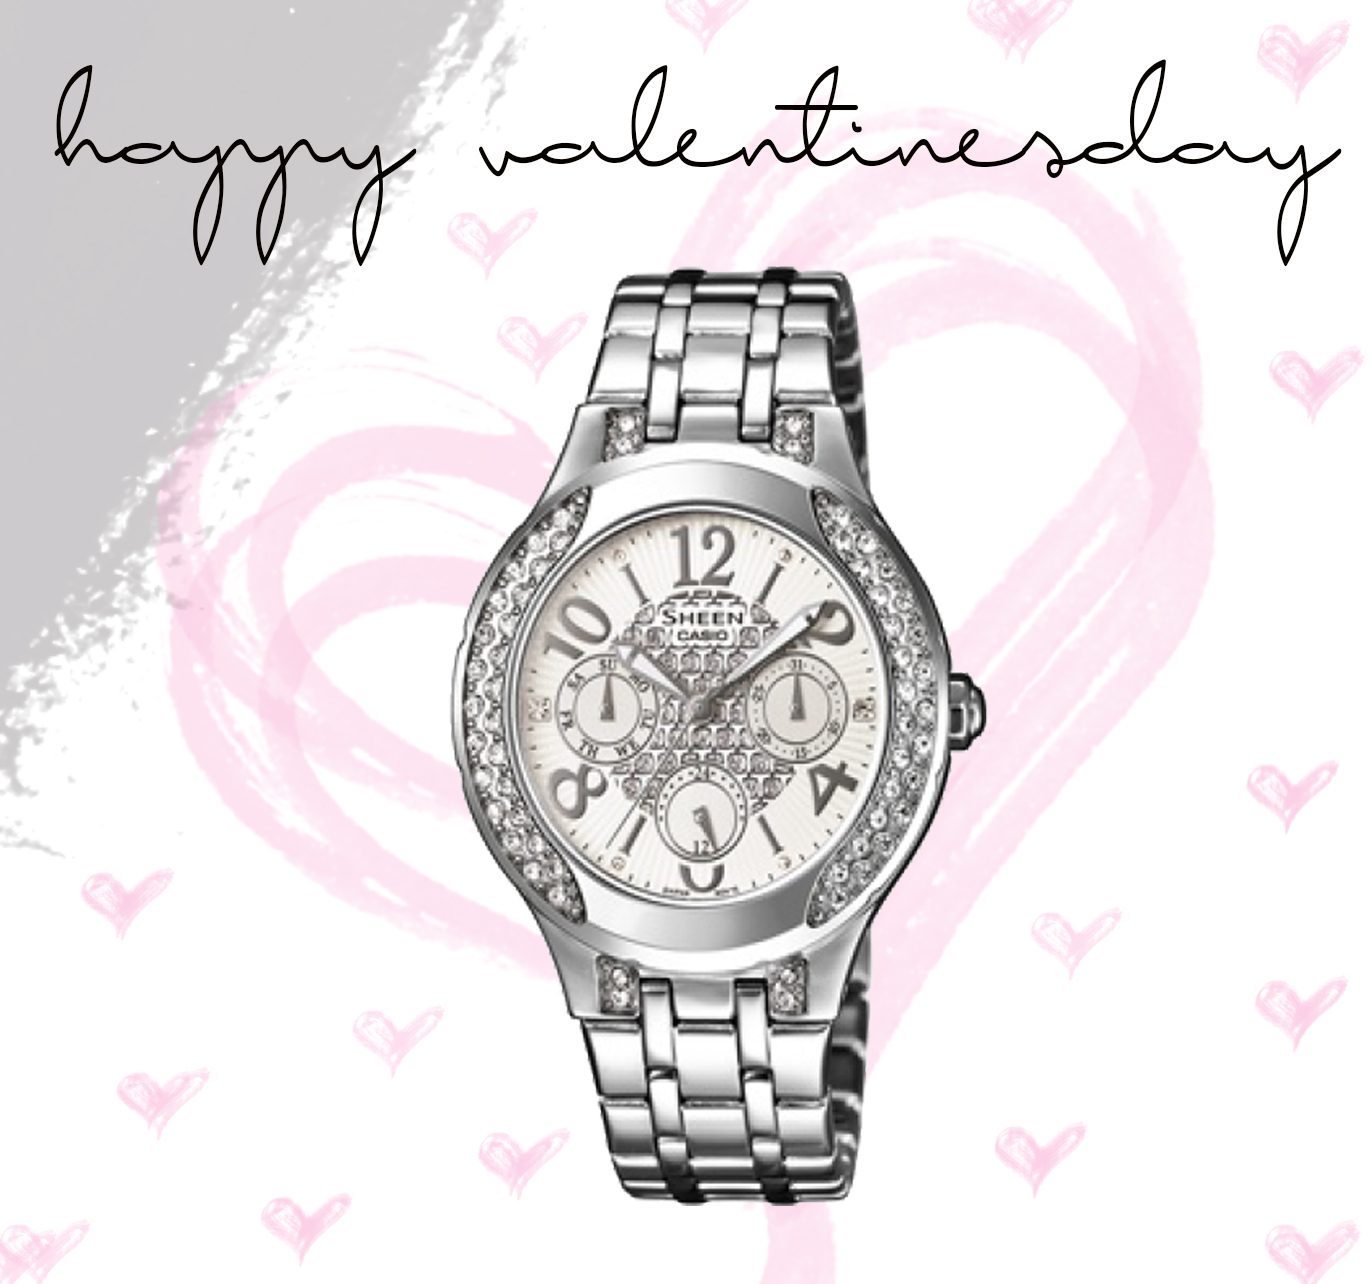 valentinstag-verlosung-uhr-giveaway-modeblog-fashionblog